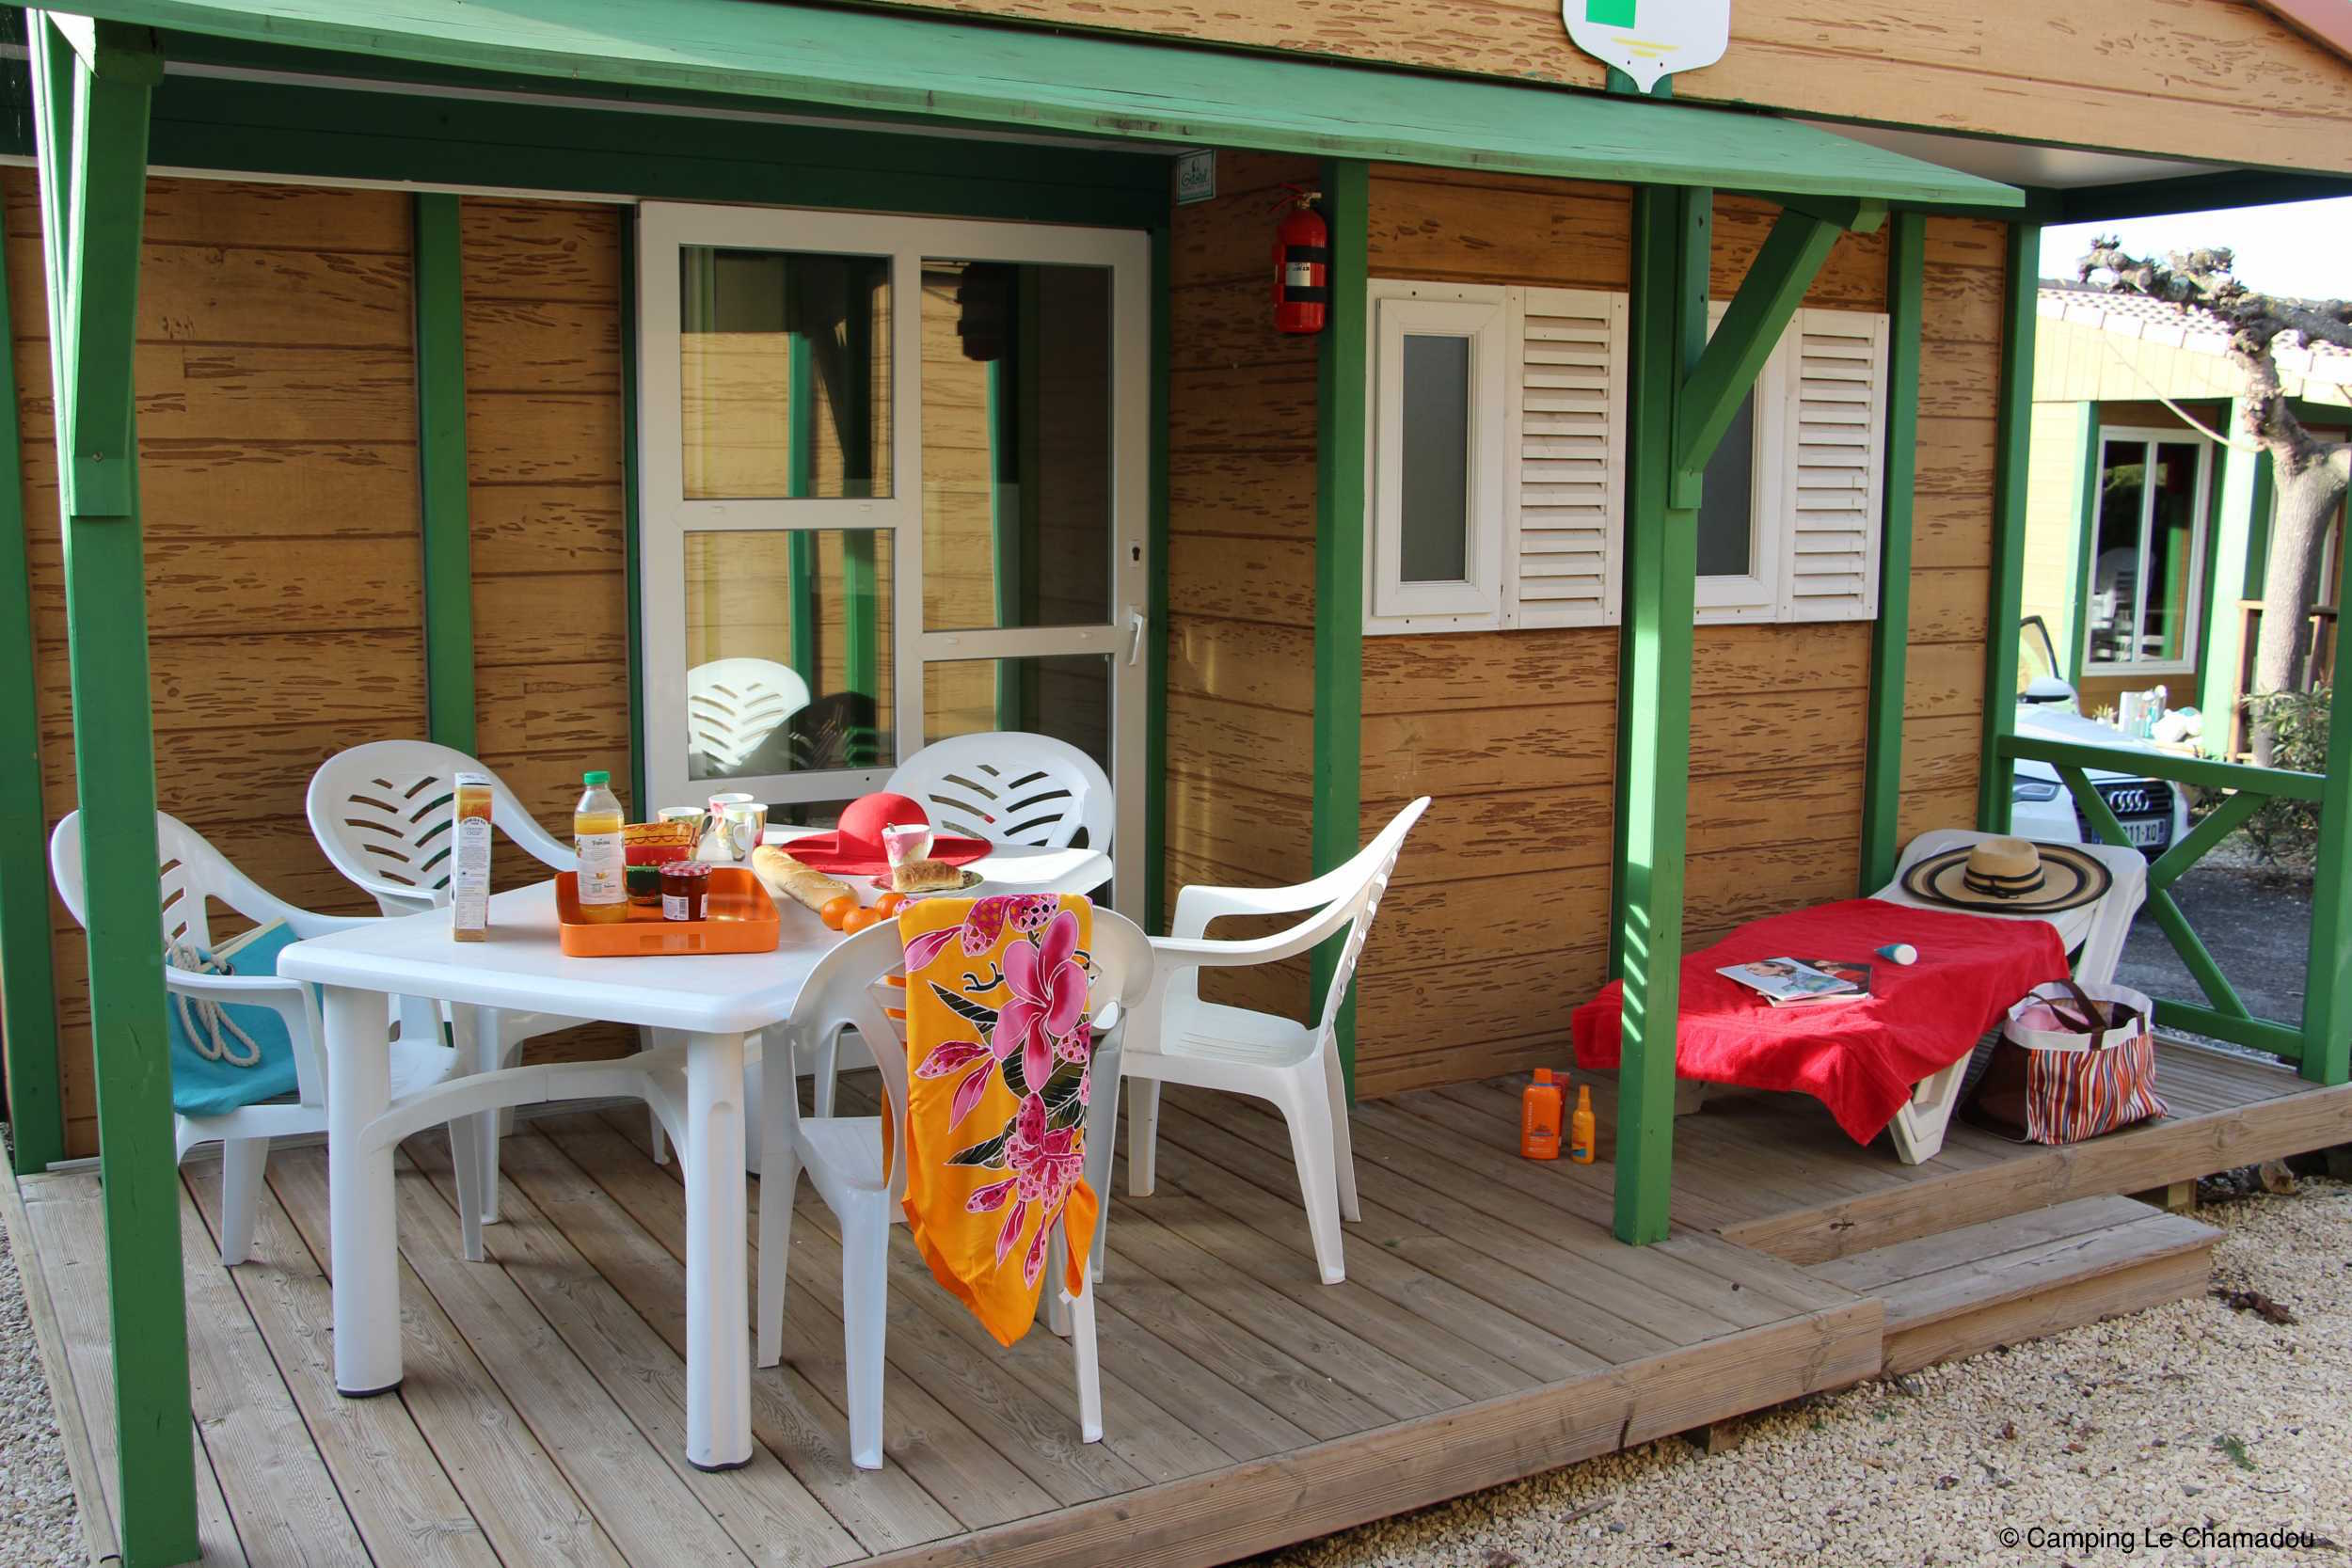 CampingLeChamadou-sudardeche-4etoiles-locations-club7.jpg